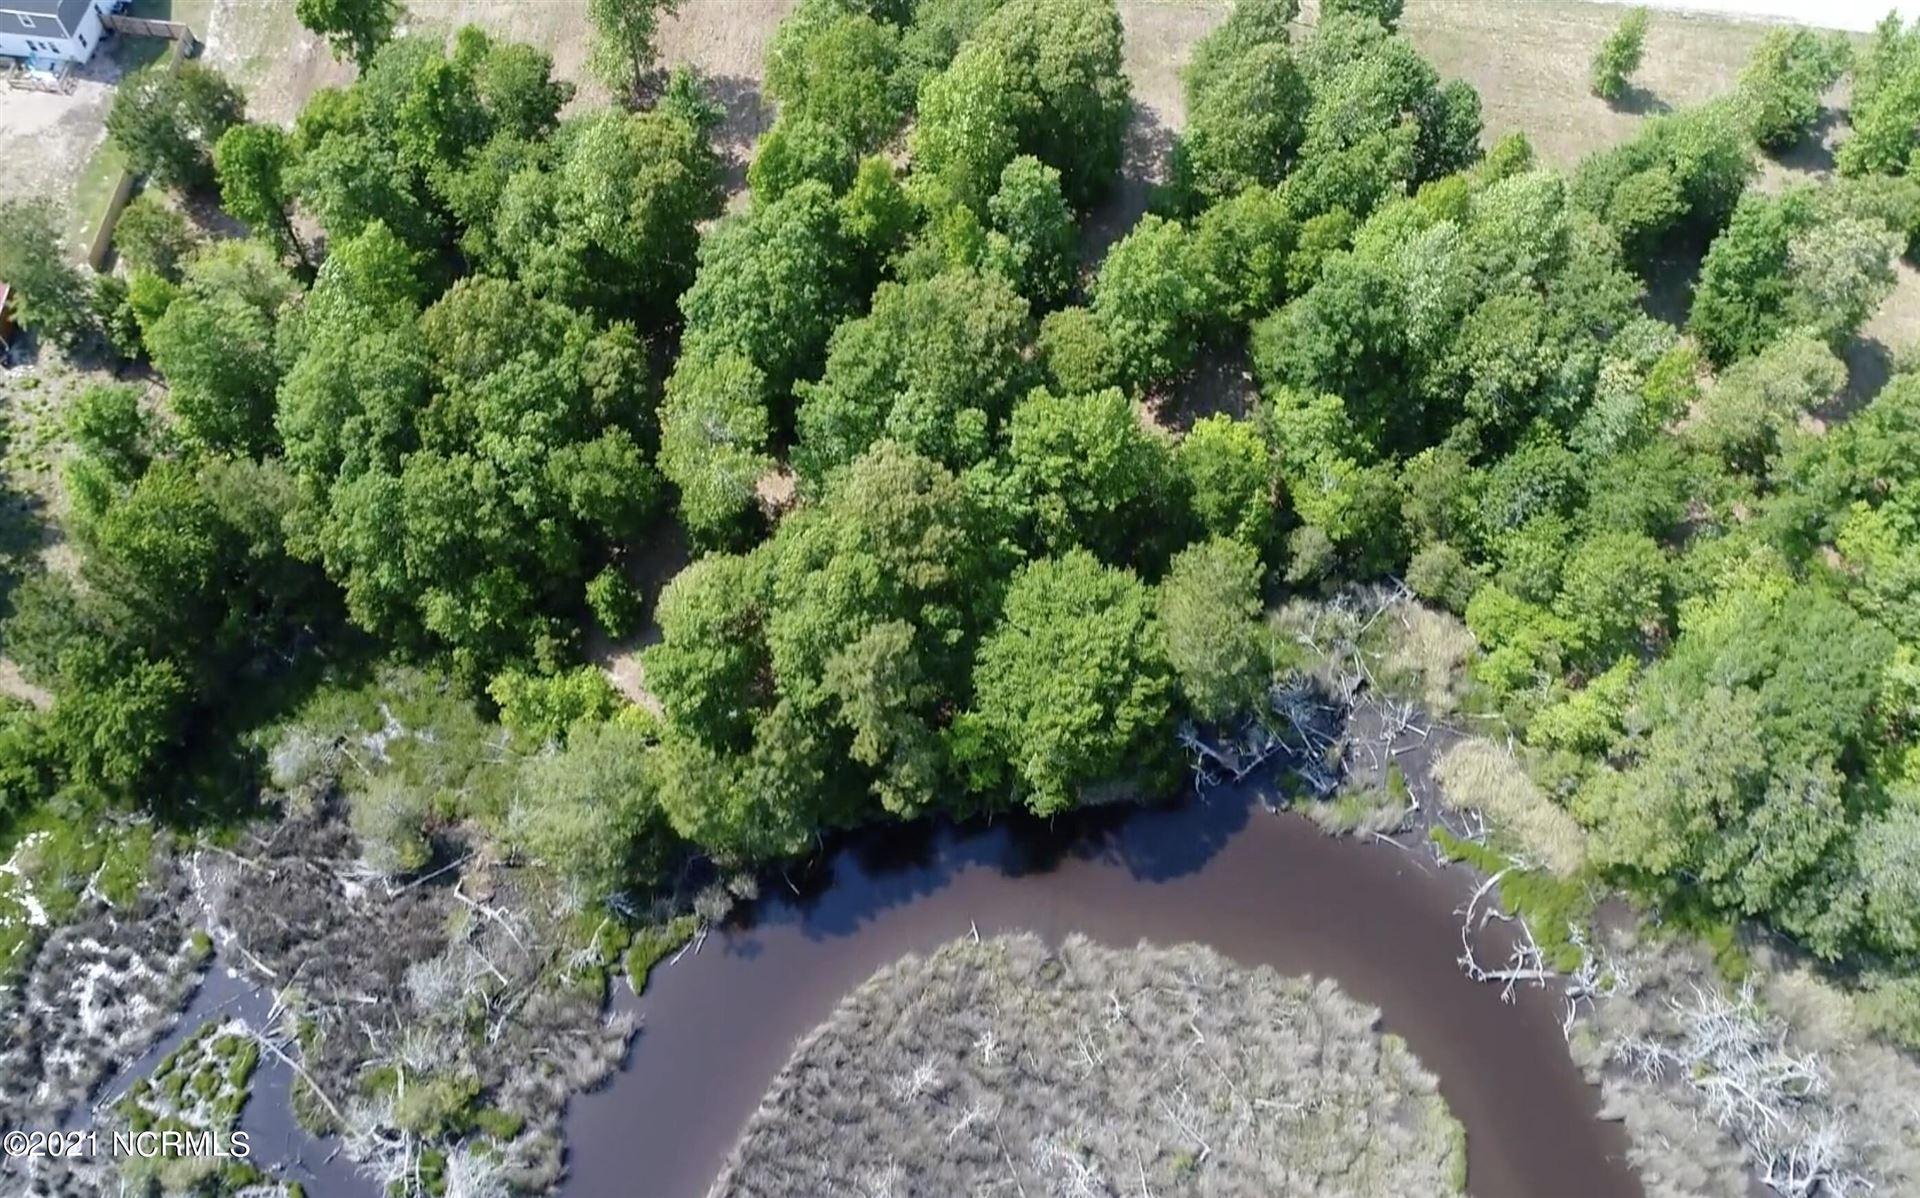 Photo for 260 Everett Yopp Drive, Sneads Ferry, NC 28460 (MLS # 100090044)